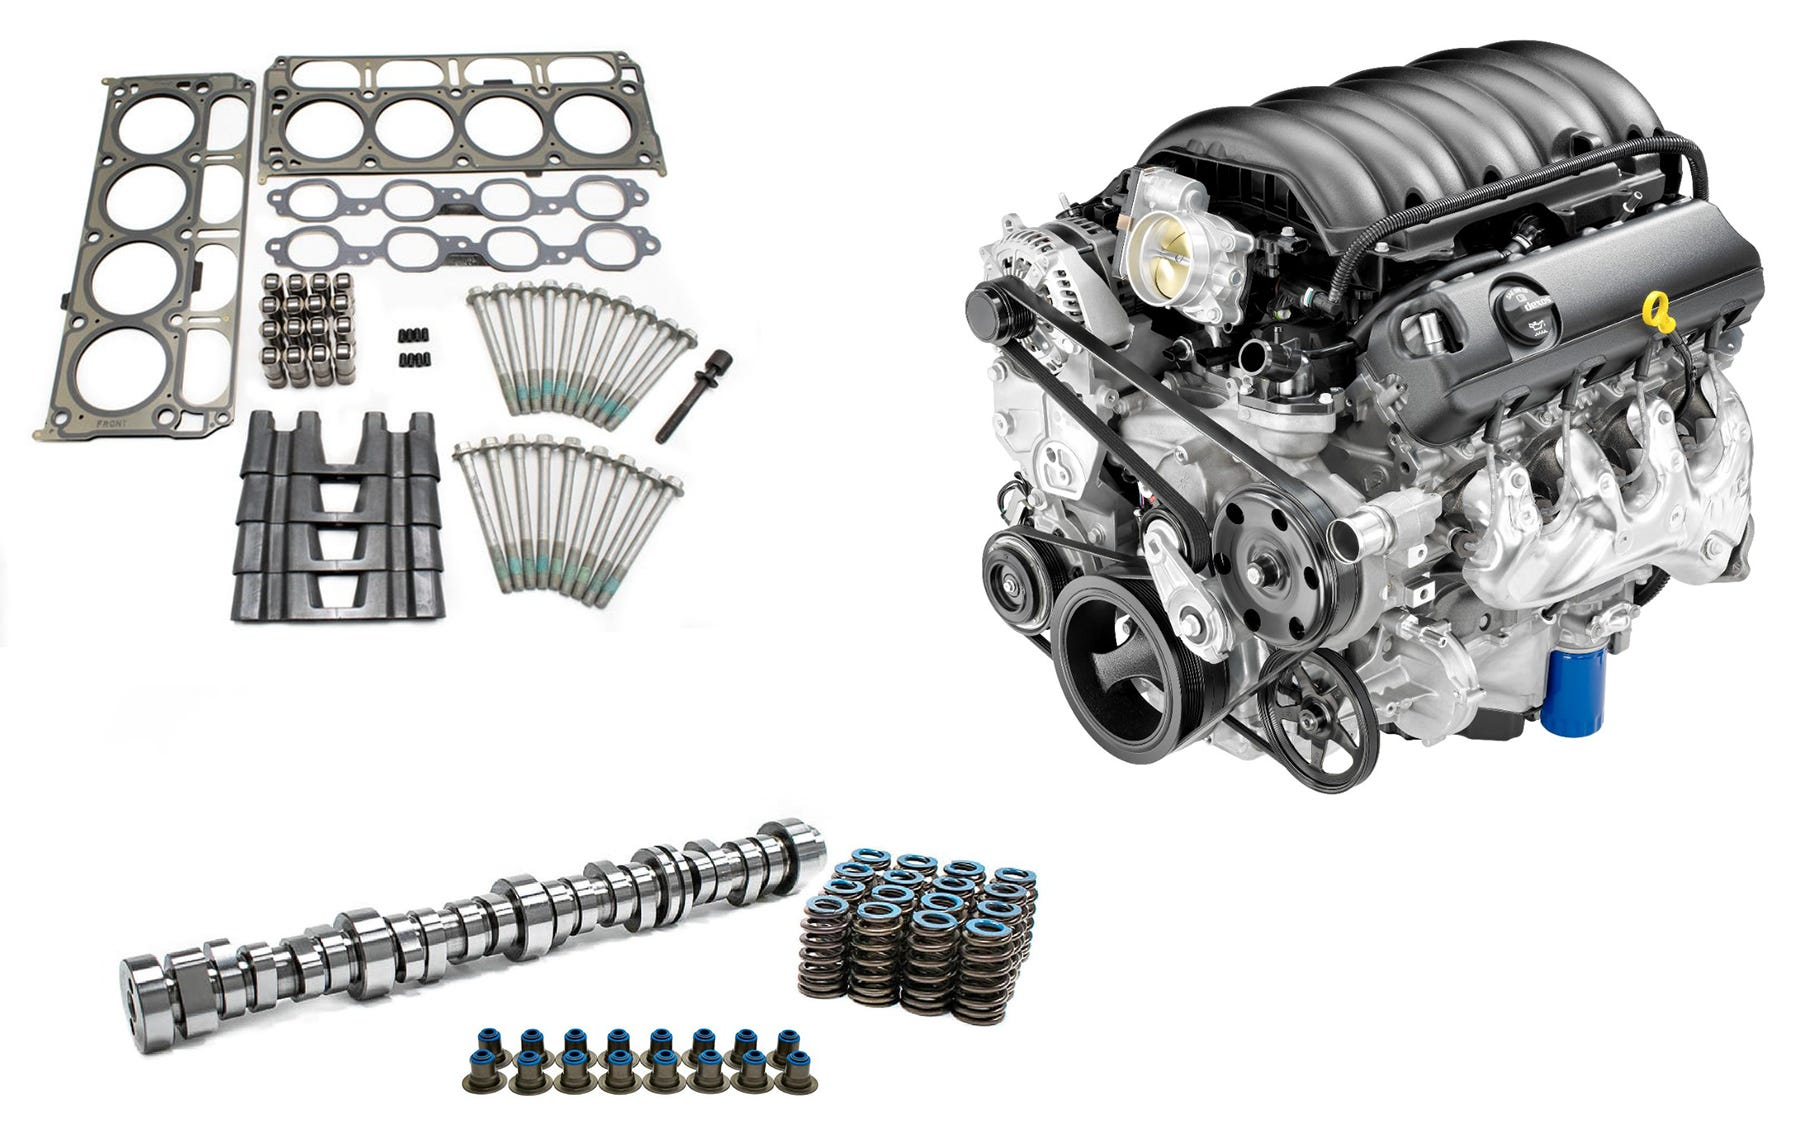 L83 5.3L CRATE ENGINE COMBO